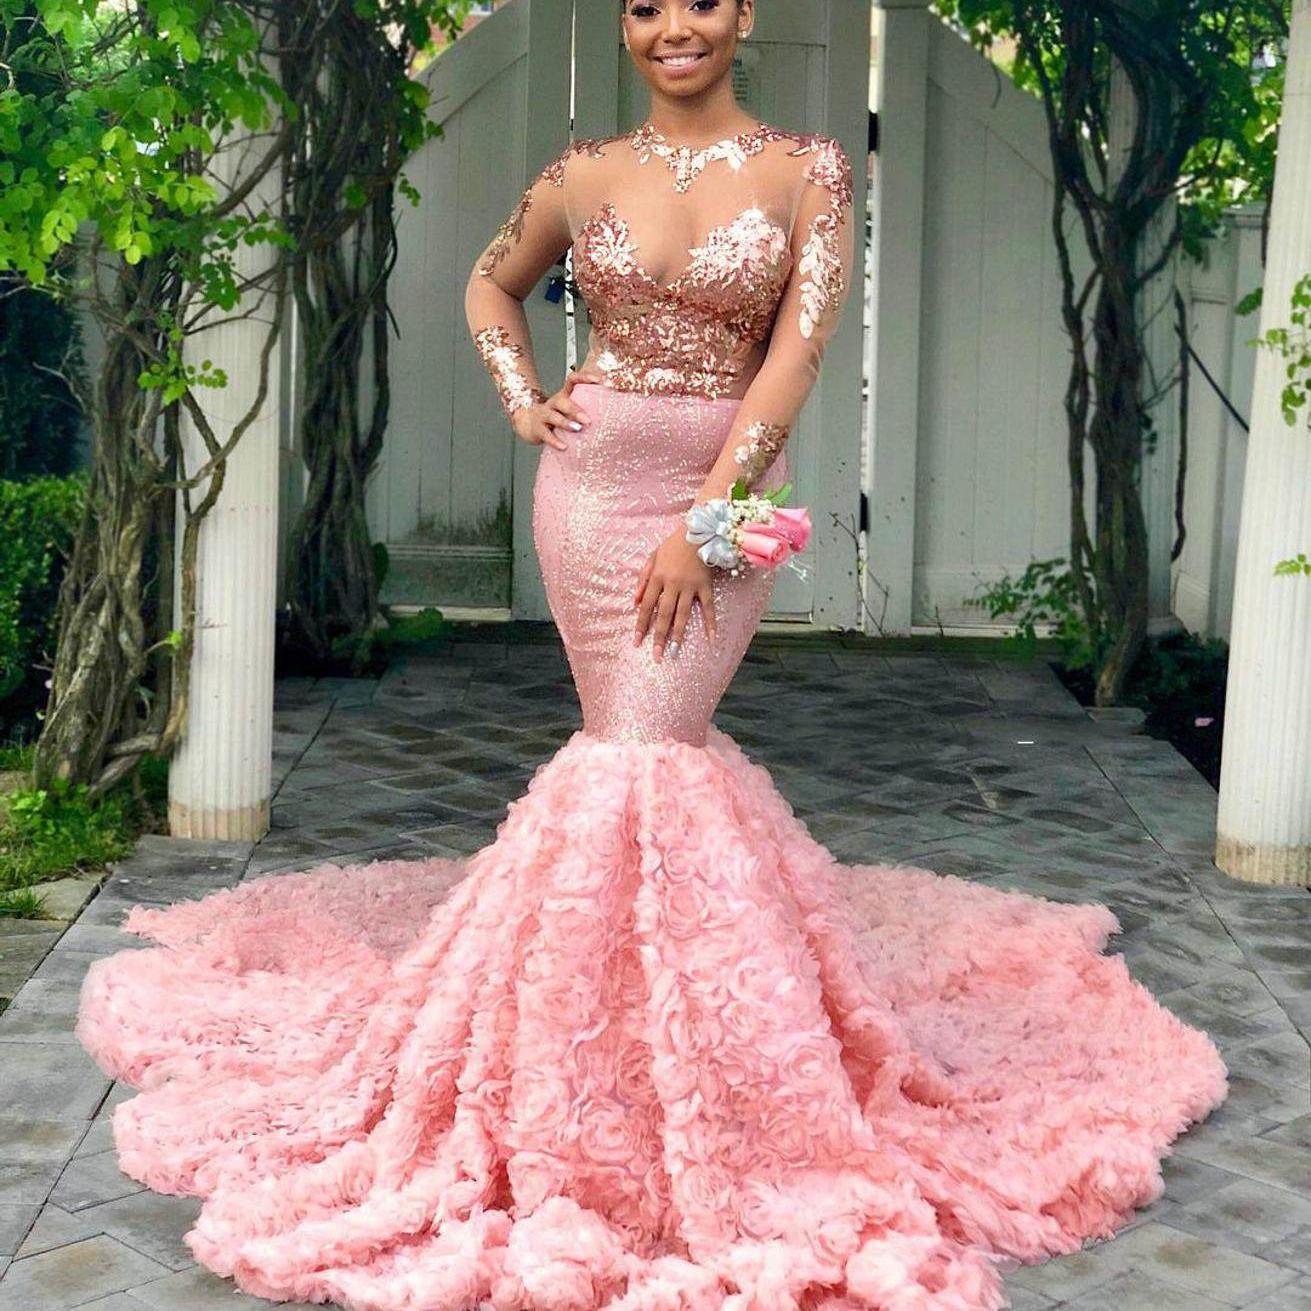 Rosa da sereia Vestidos de baile Sheer Jewel Neck Long Sleeve Sequin apliques de renda Evening vestidos de ver através da celebridade Vestido formal Pageant Vestido